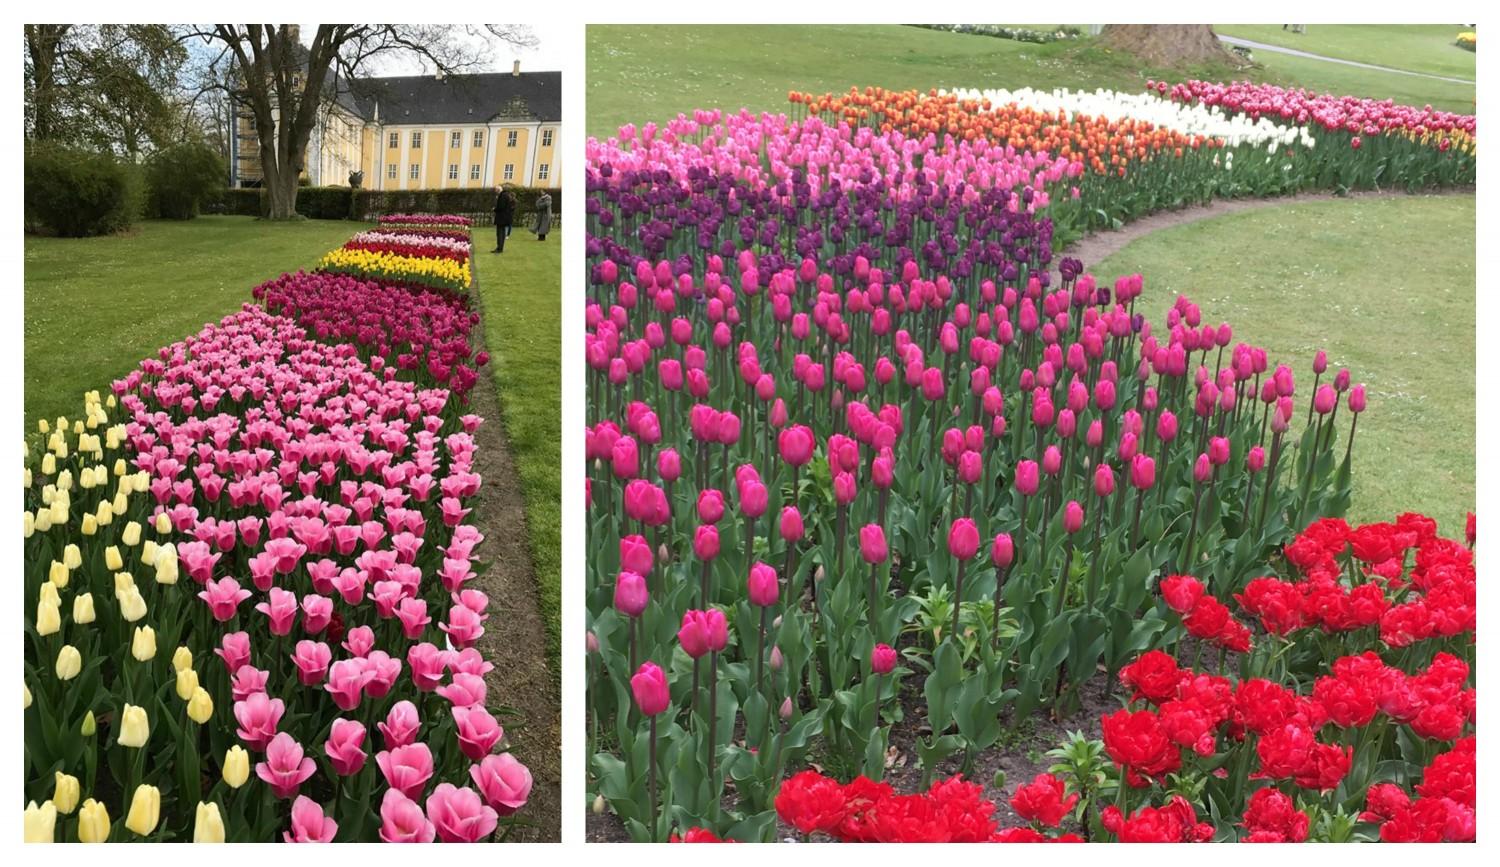 Tulipanfestival på Gavnø